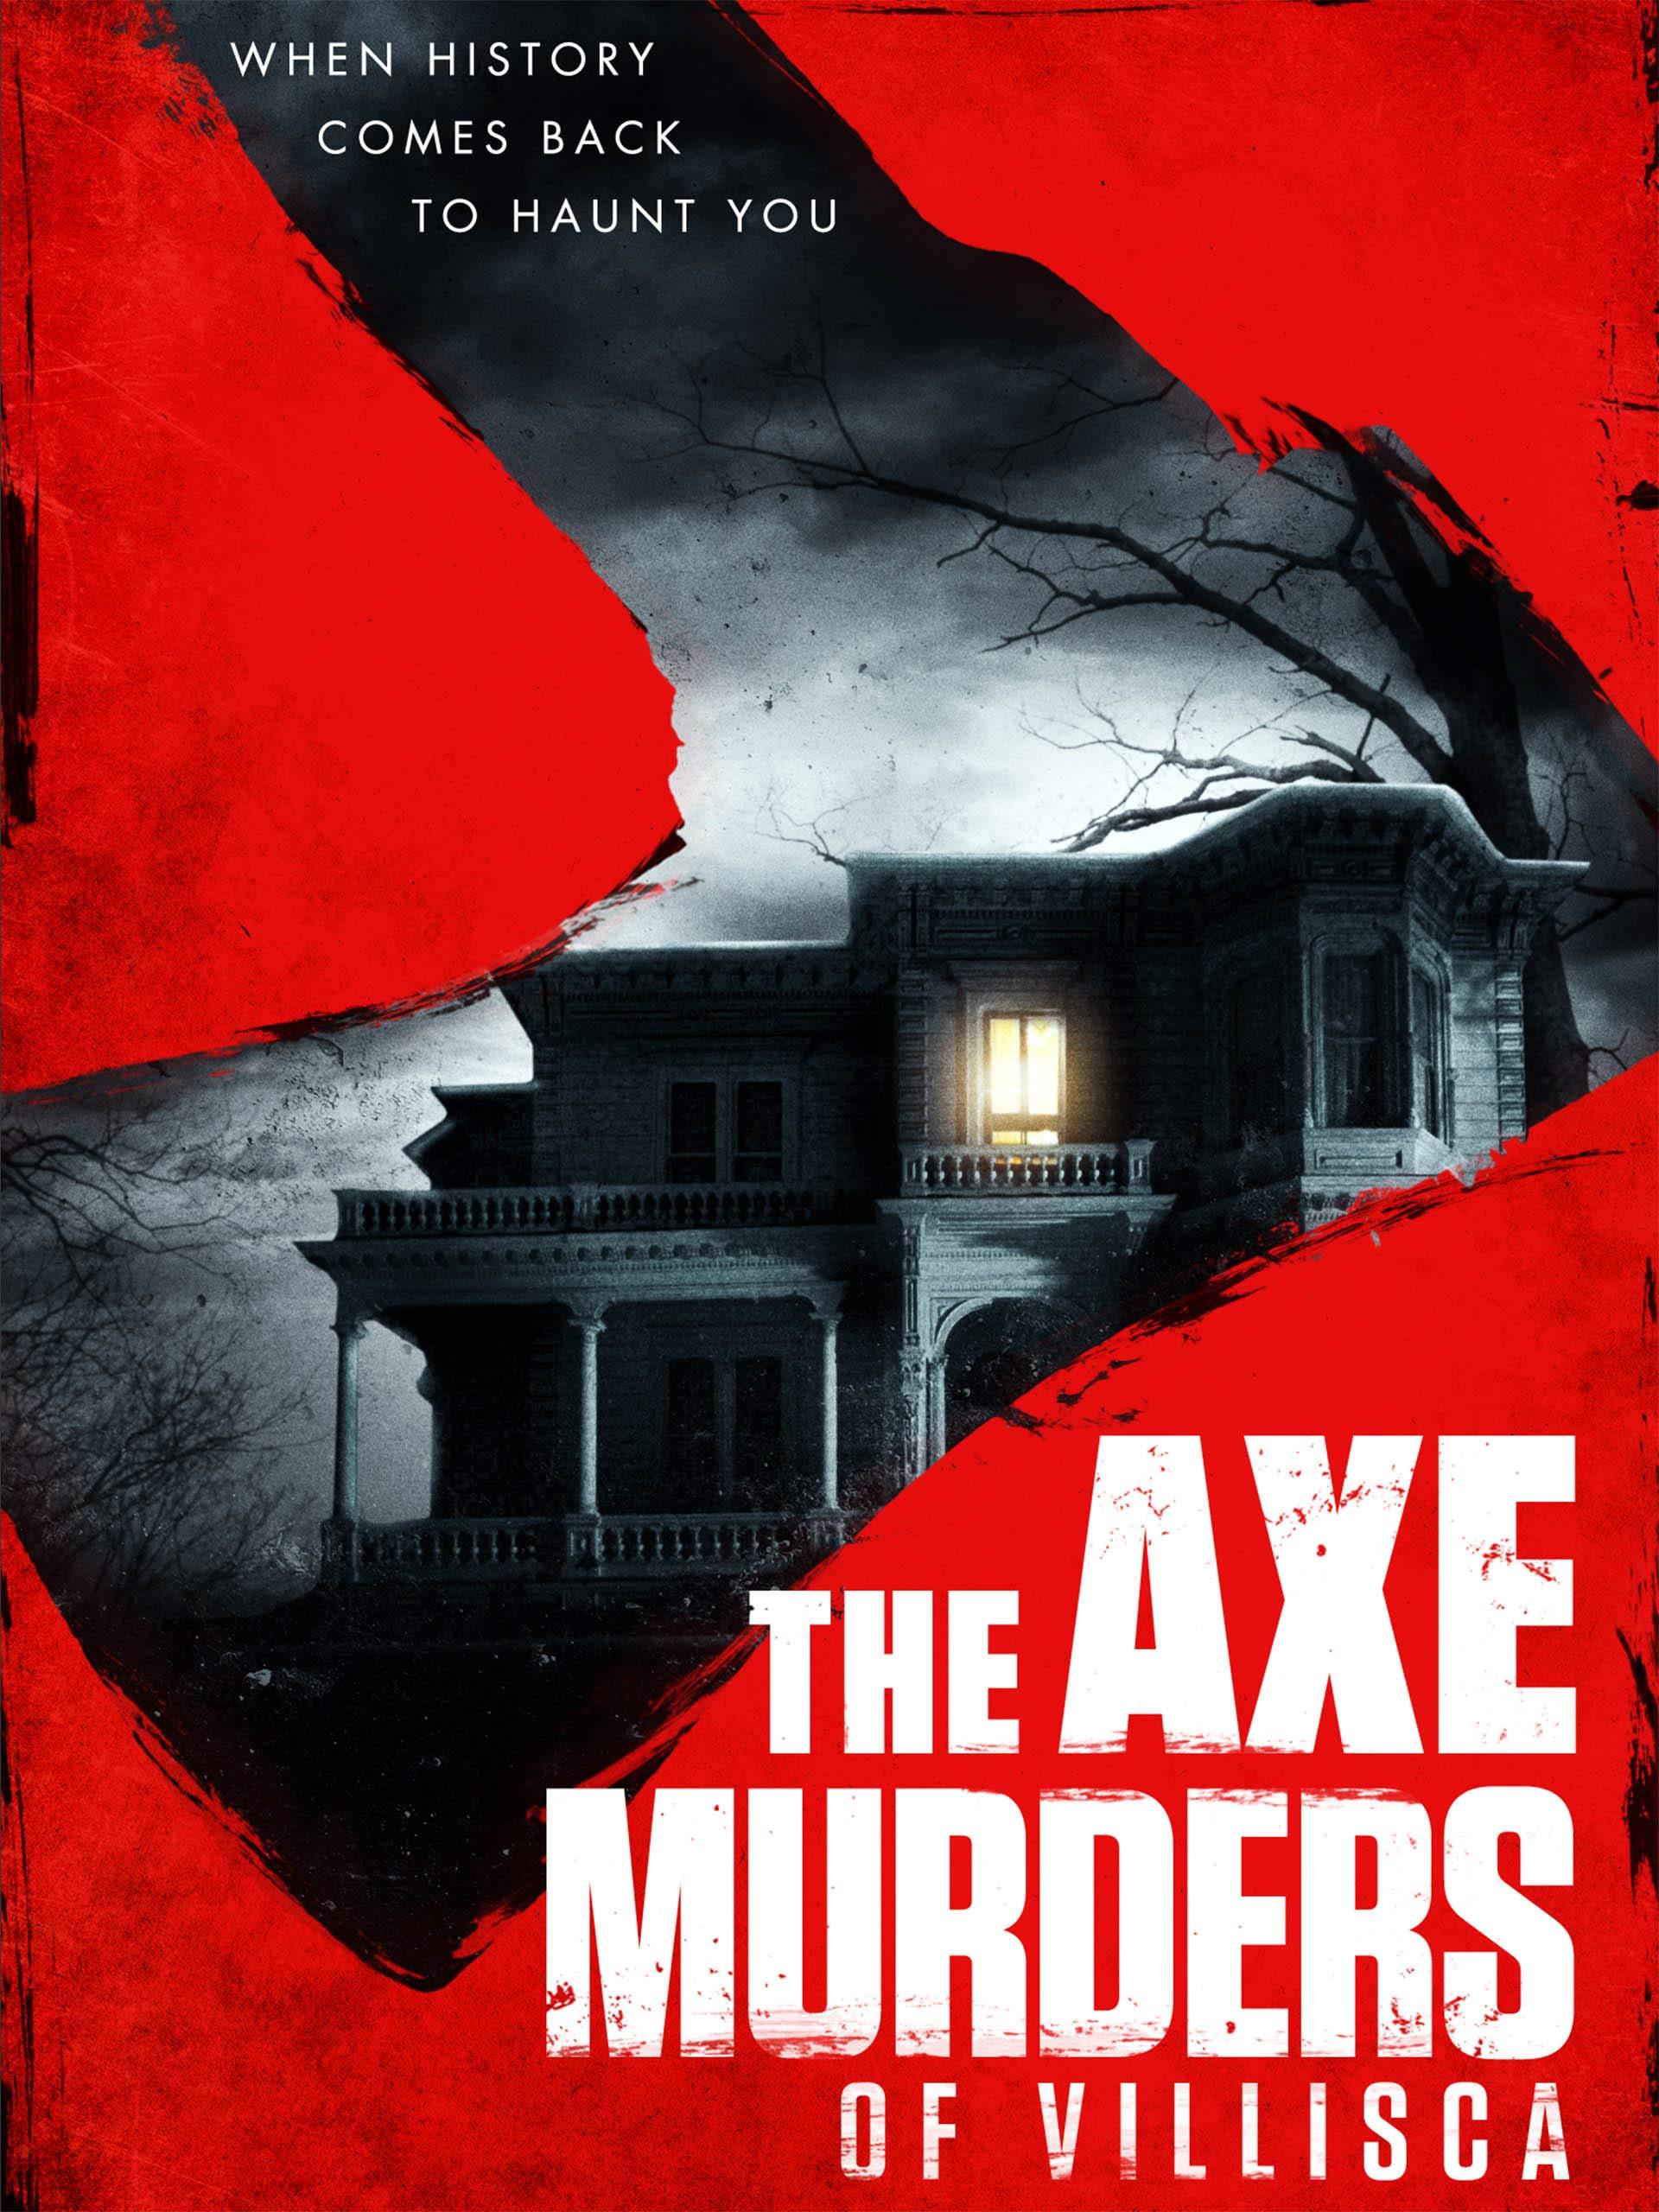 The Axe Murders of Villisca on Amazon Prime Video UK